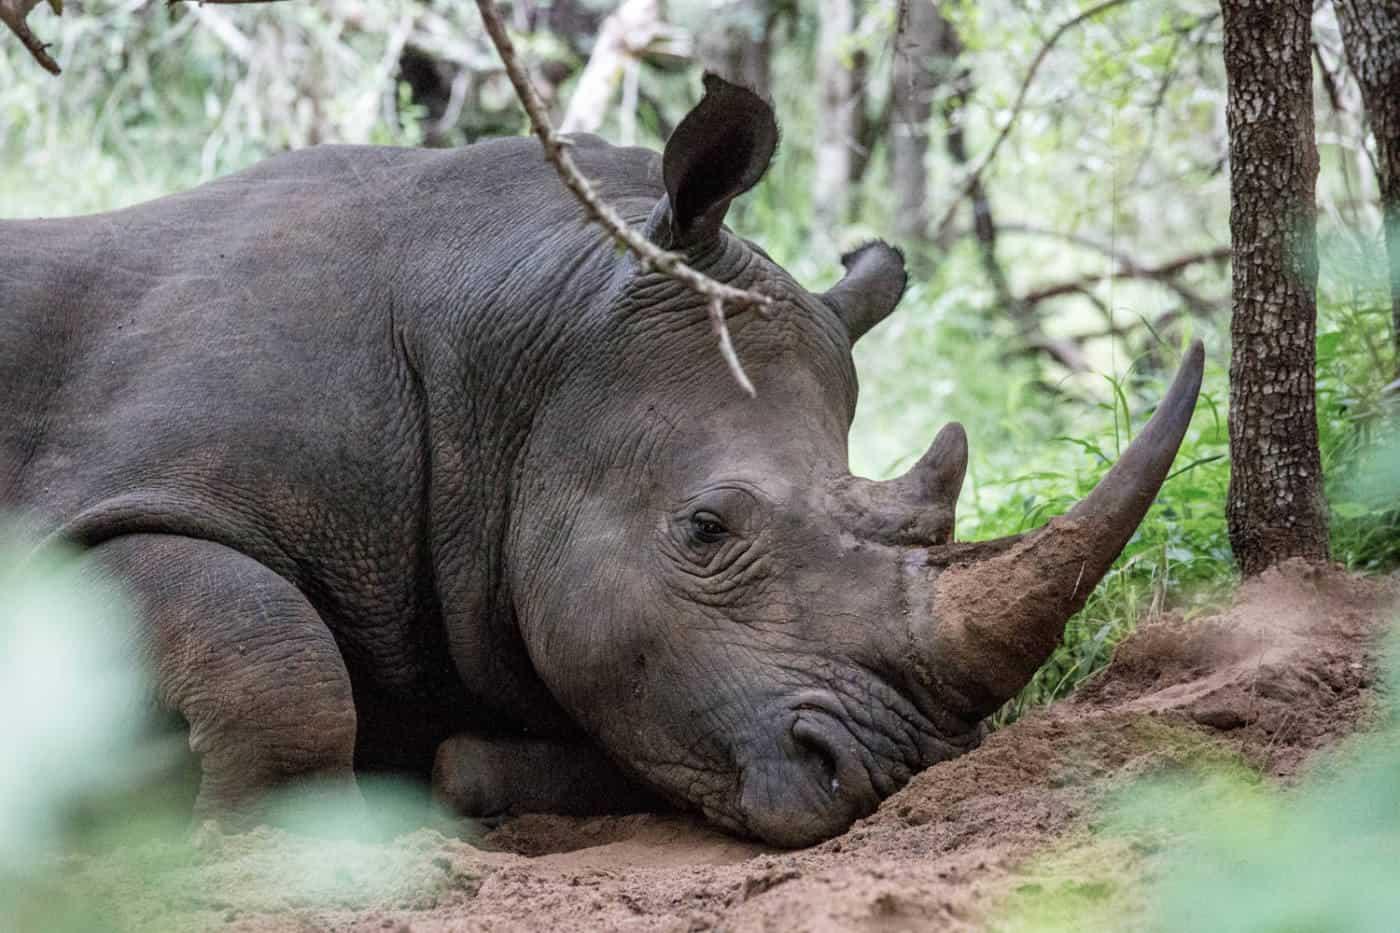 Seeing a white rhino on a Mkhaya Game Reserve safari